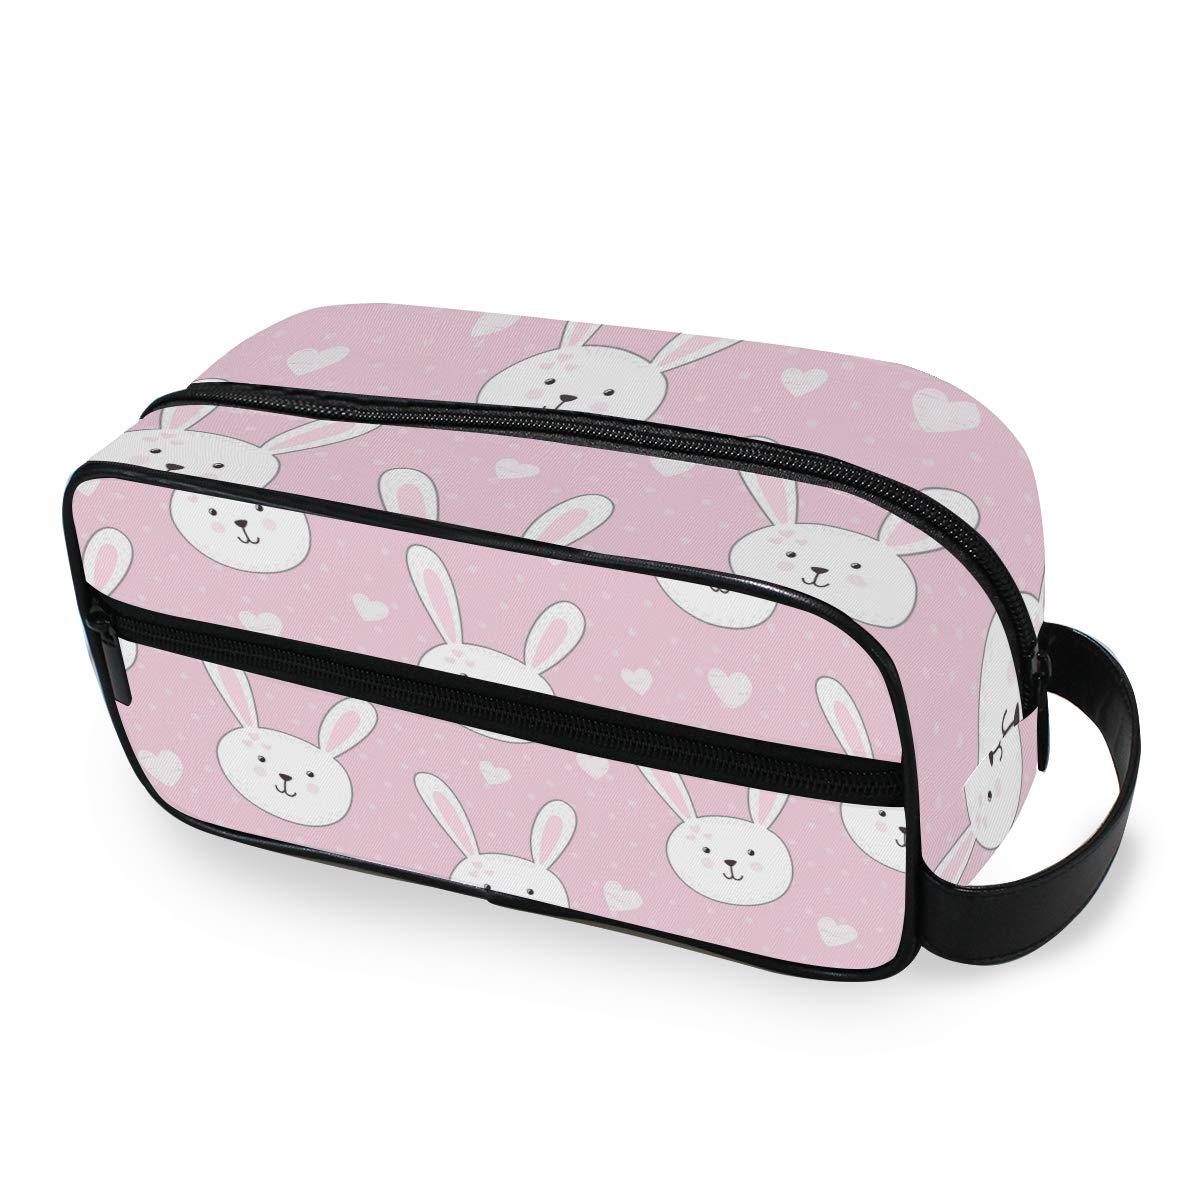 Travel Toiletry Bag for Women or Men - Cartoon Animal Rabbit Printing Handing Cosmetic Make Up Bag Organizer Pouch for Bathroom Shower